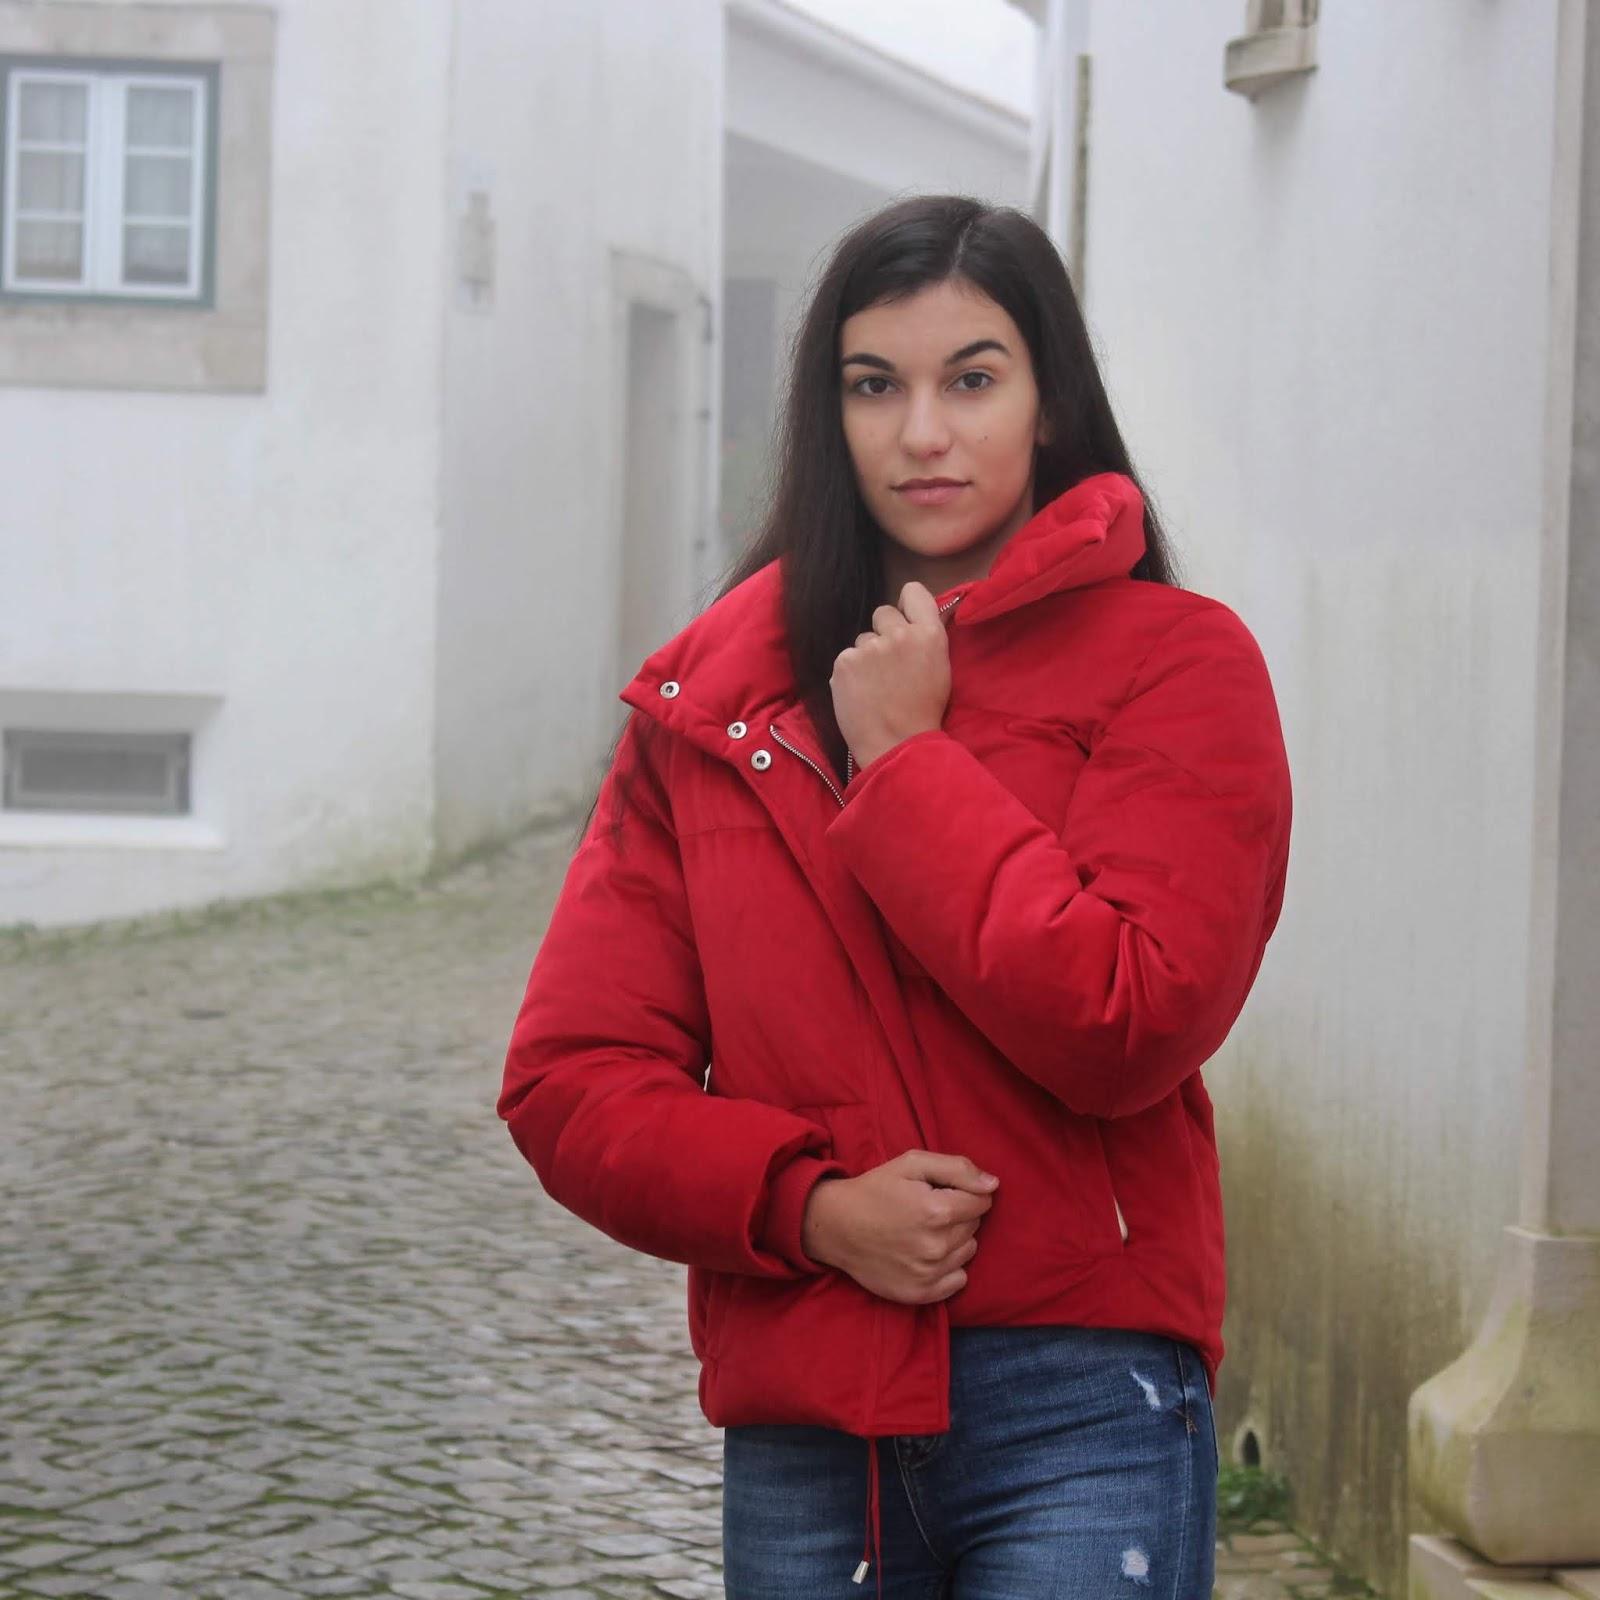 Onde comprar puffer jacket vermelho?